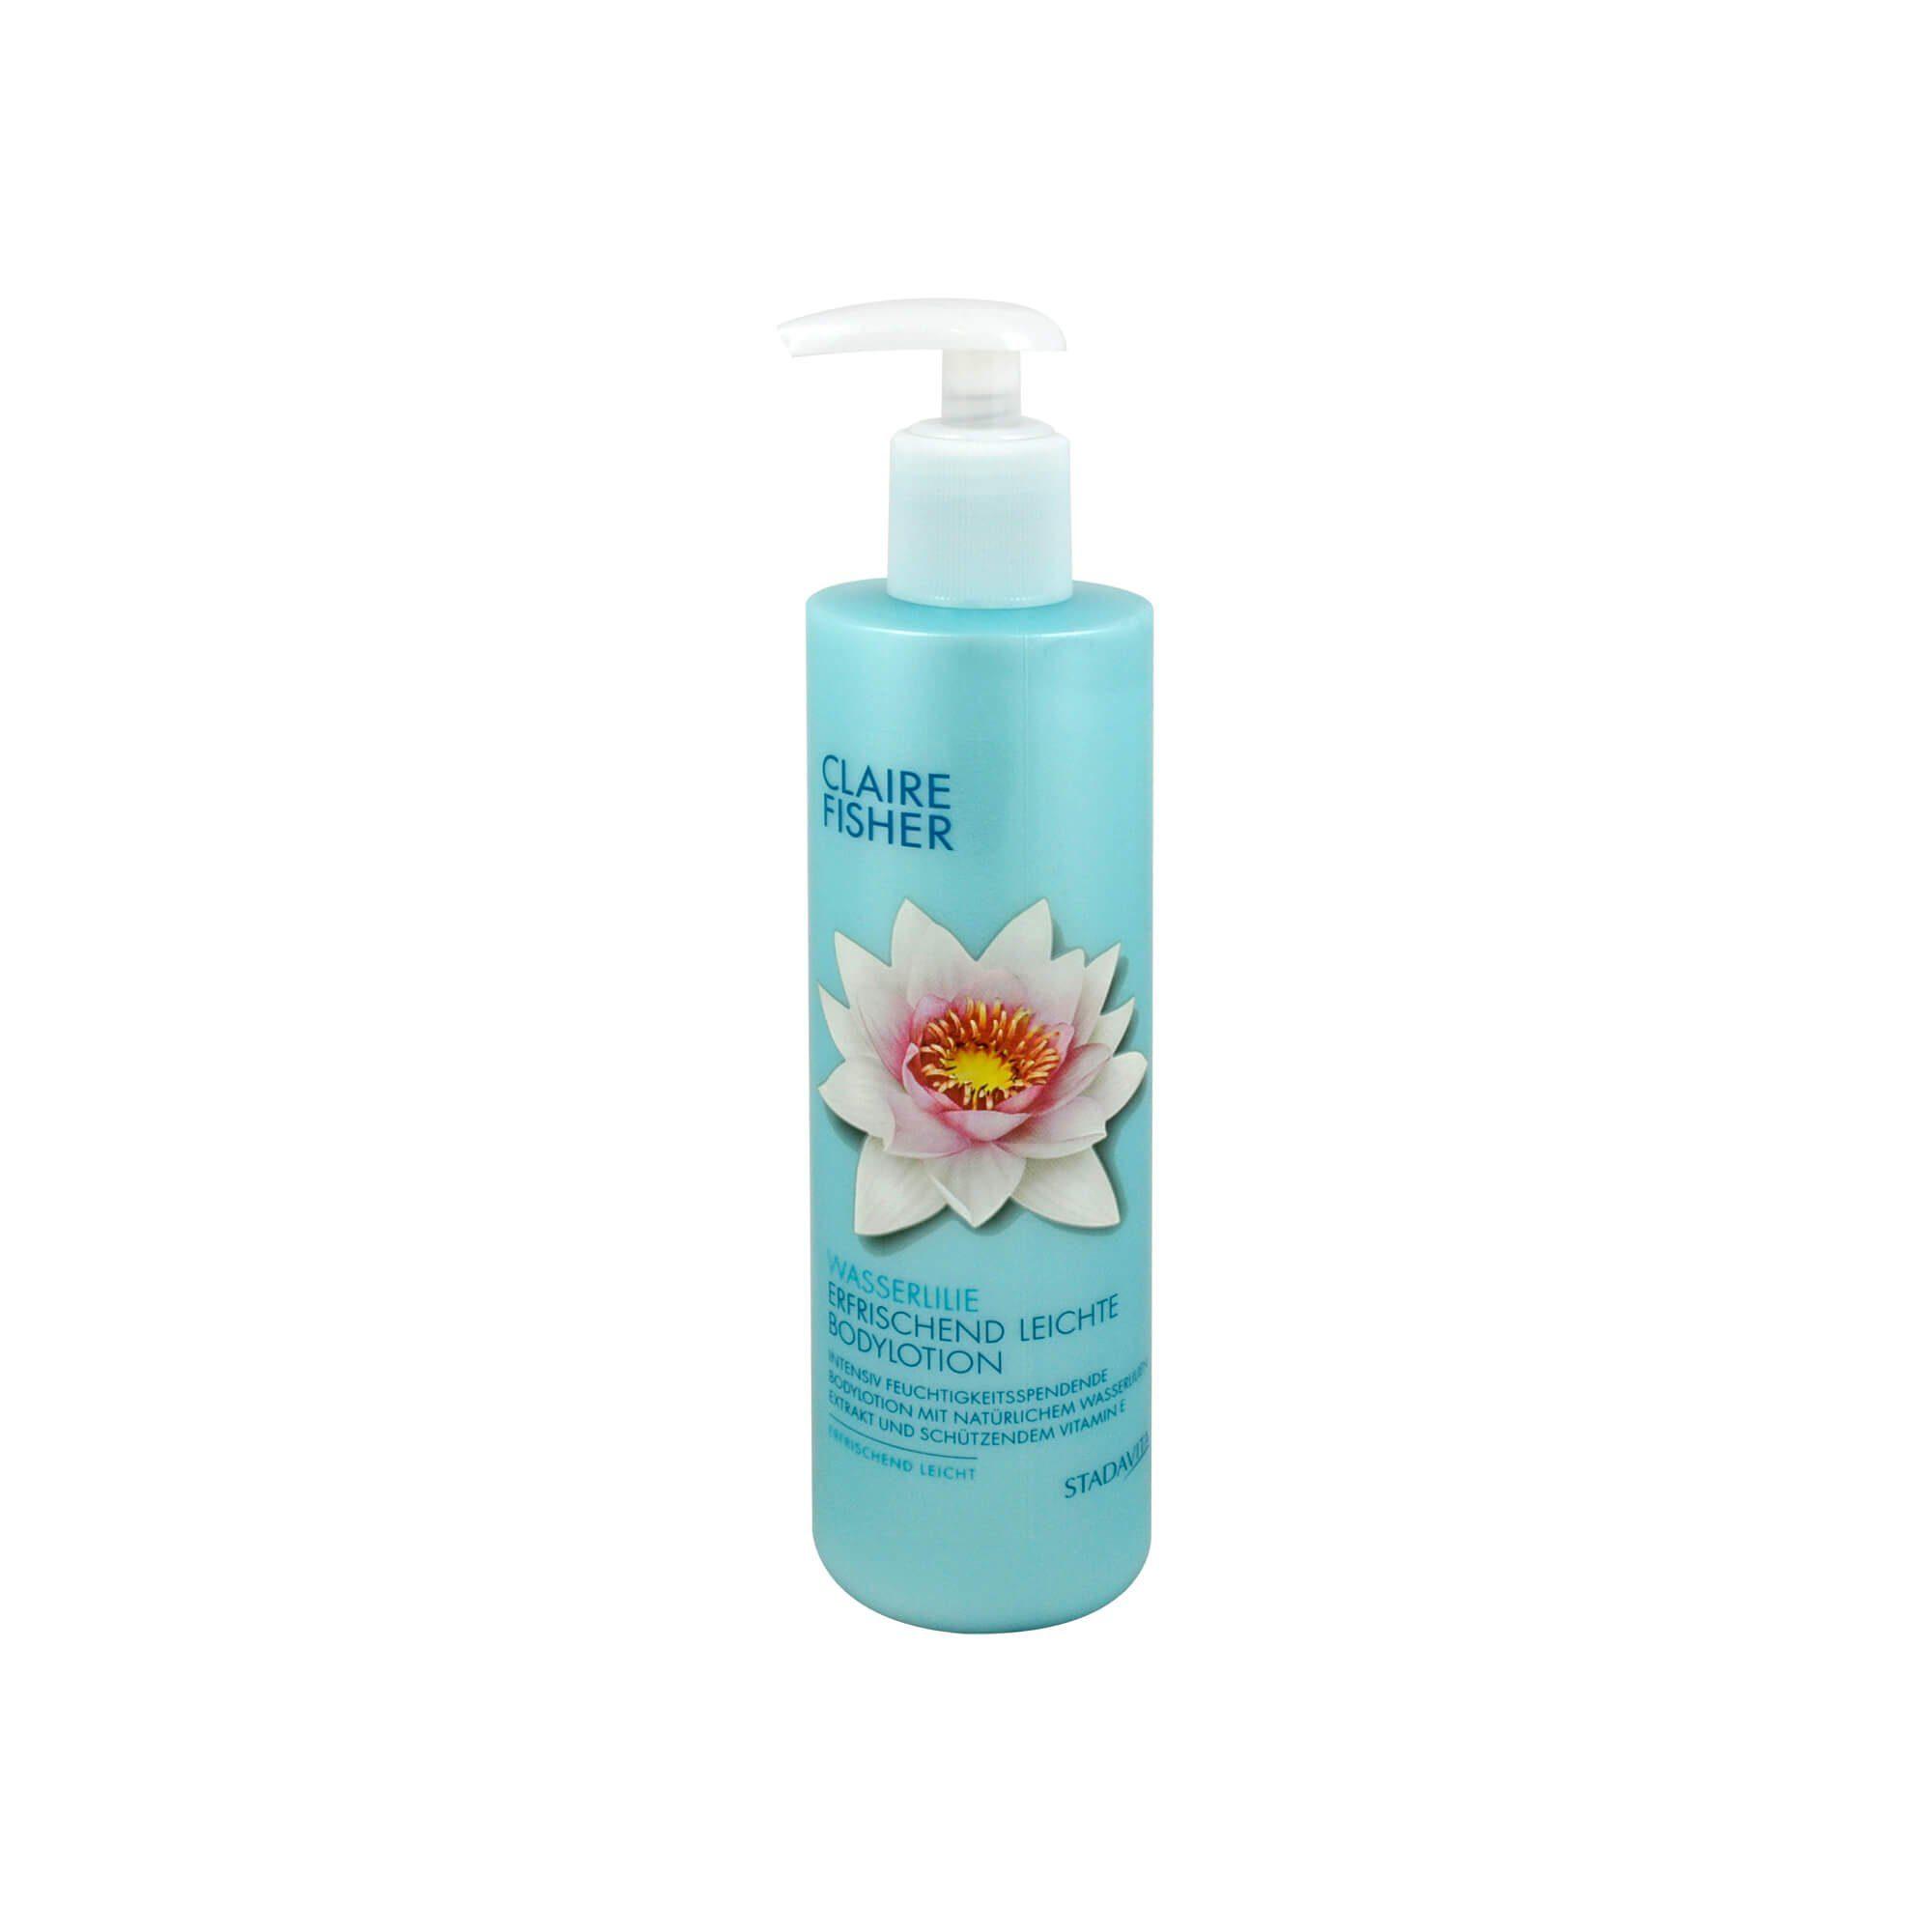 Claire Fisher Natur Classic Wasserlilien Bodylotion , 300 ml